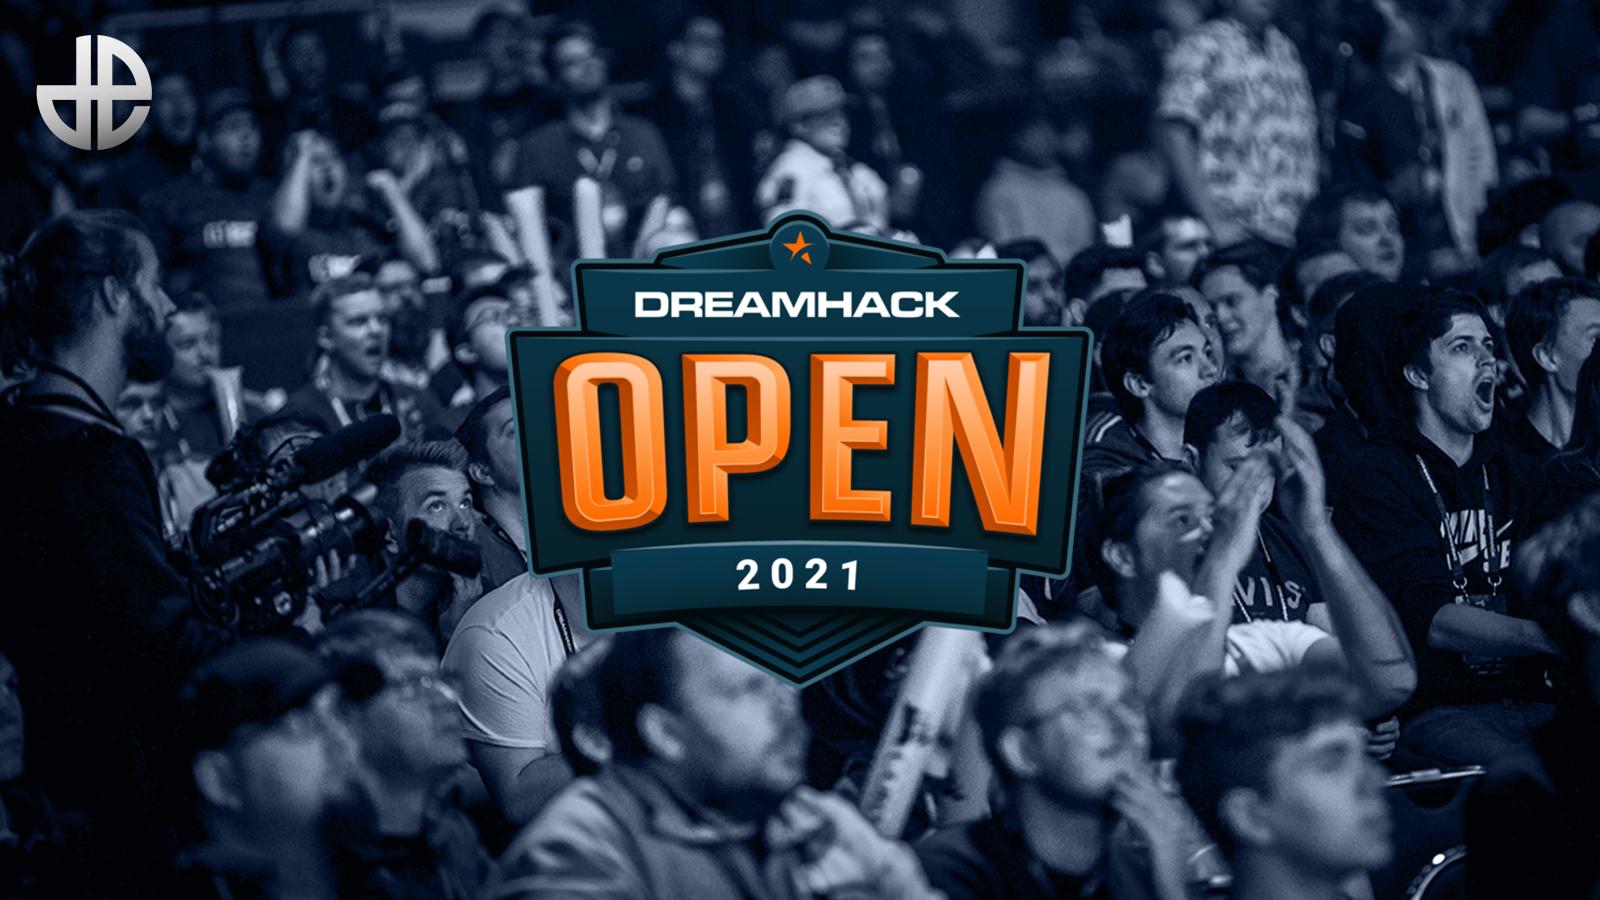 DreamHack Open January 2021